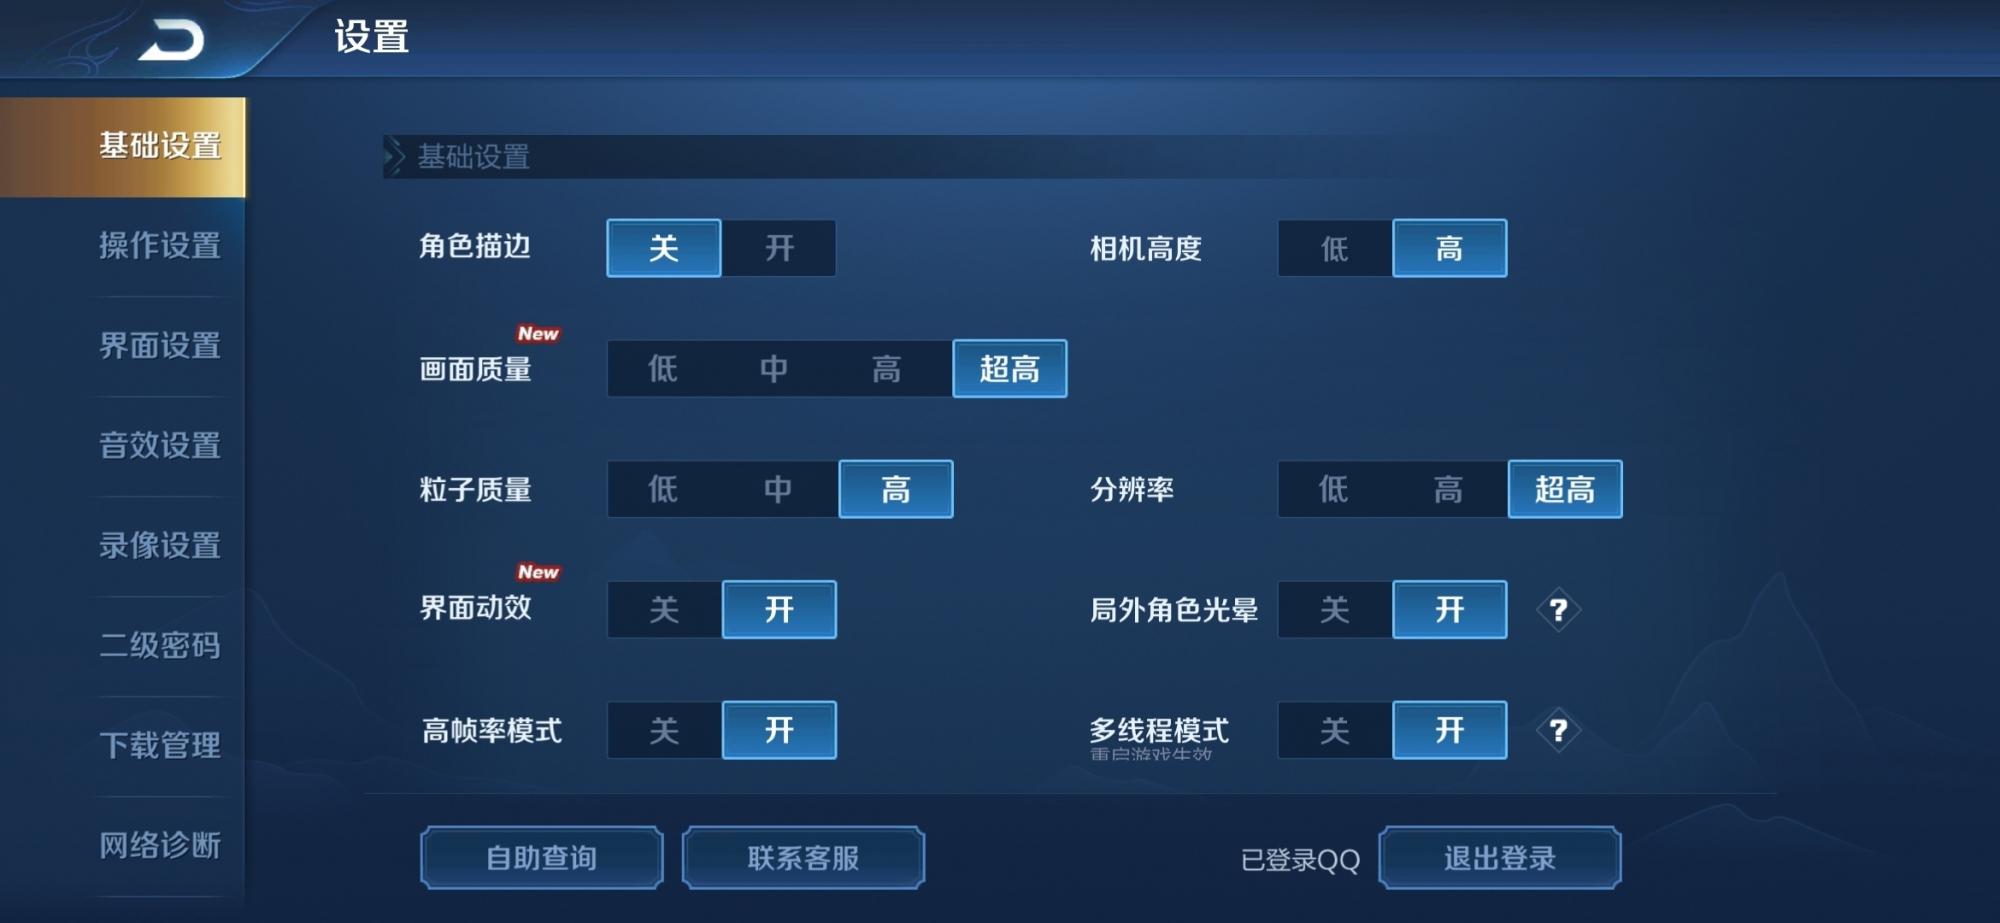 Screenshot_20190608_203924_com.tencent.tmgp.sgame.jpg